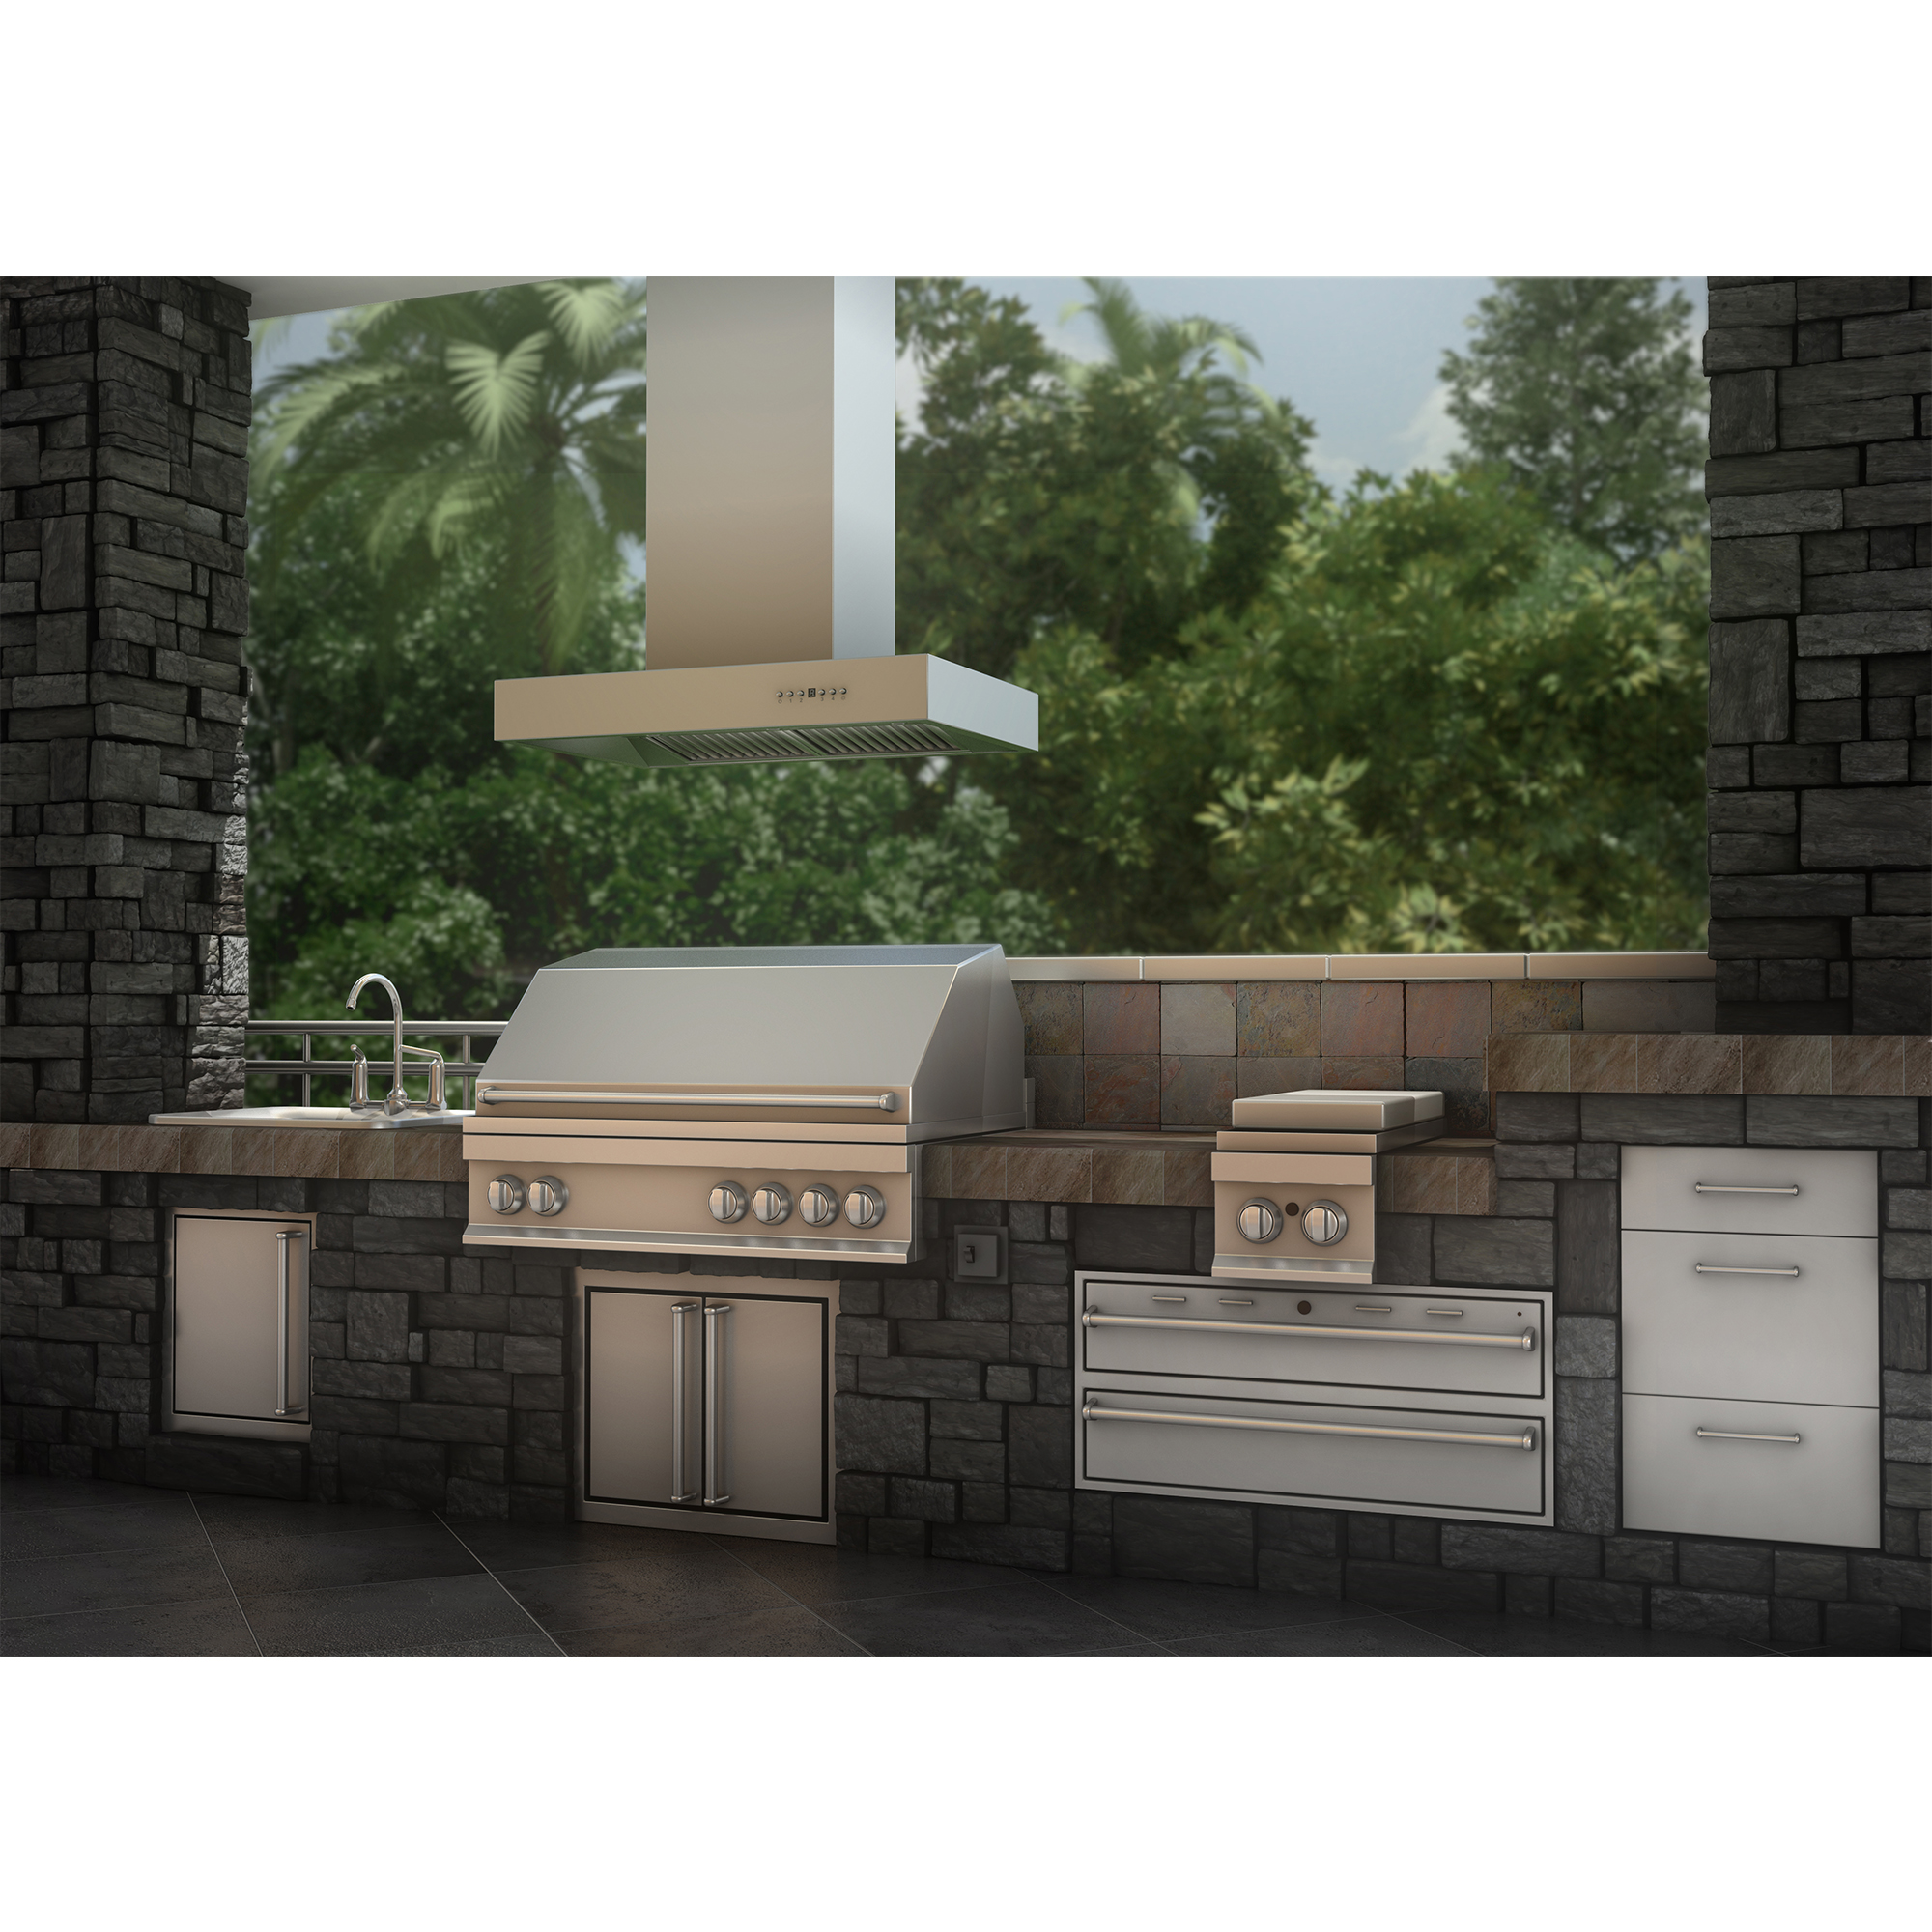 zline-stainless-steel-island-range-hood-KECOMi-kitchen-outdoor-1.jpg